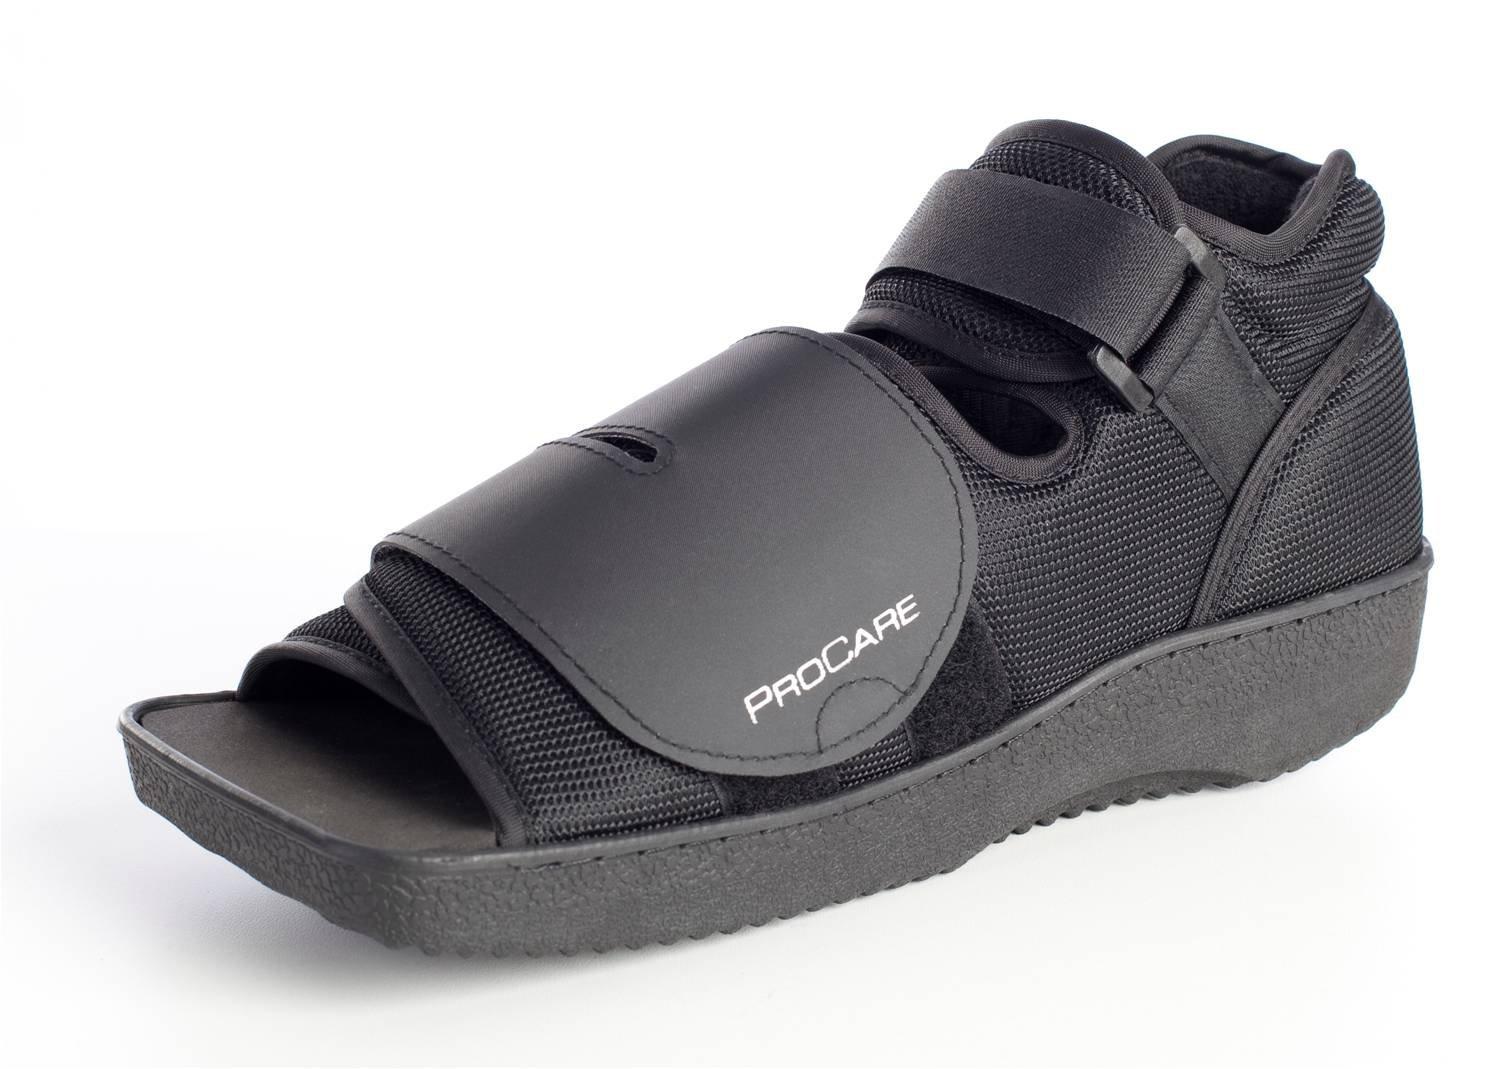 ProCare Squared Toe Post-Op Shoe, Medium (Shoe Size: Men's 7.5-9 / Women's 8.5-10)